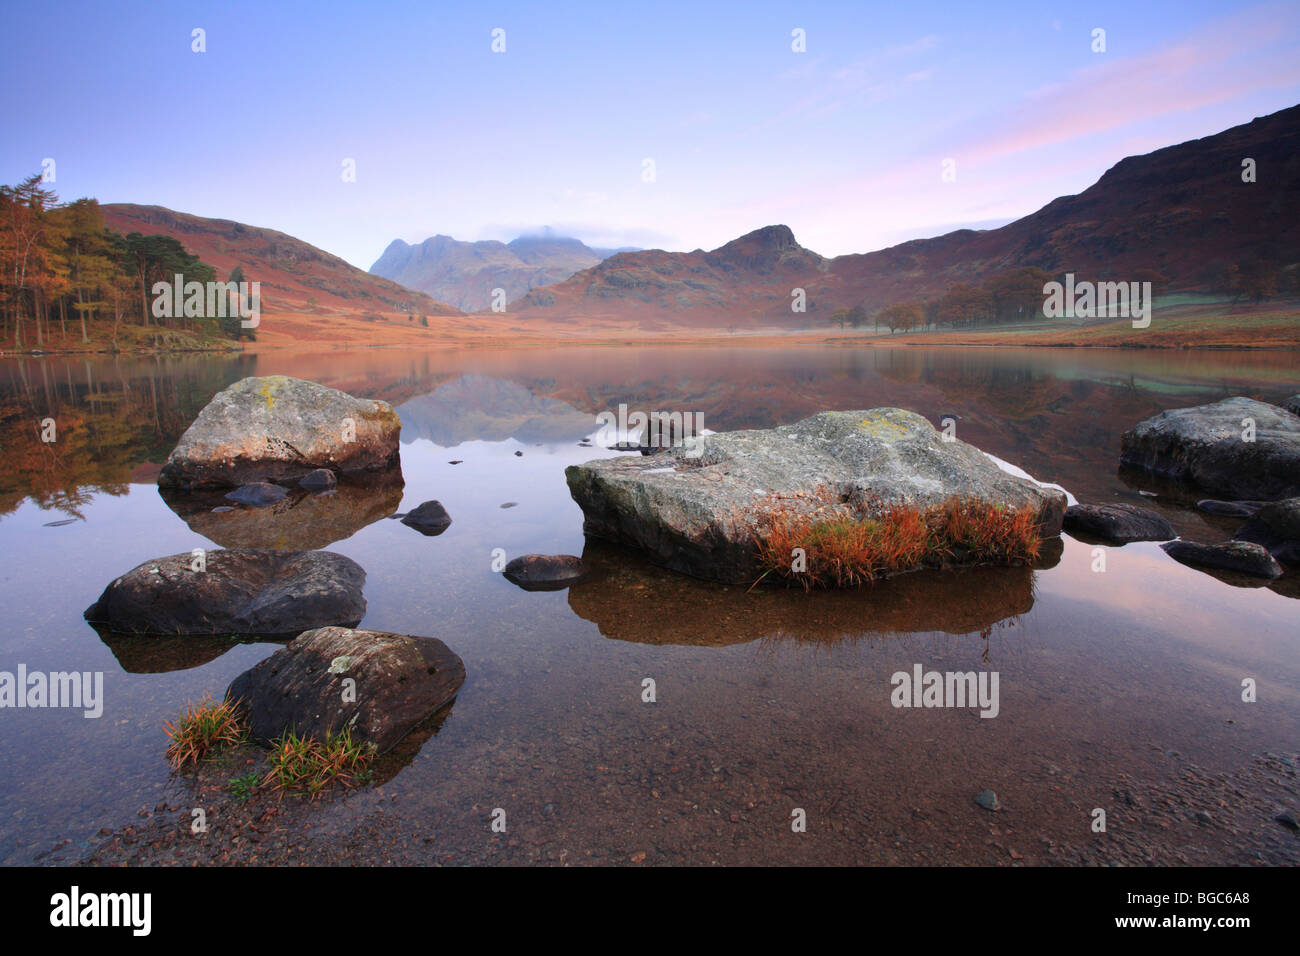 """Blea Tarn Little Langdale' refleja las rocas al borde del agua, Lake District National Park, Reino Unido. Imagen De Stock"